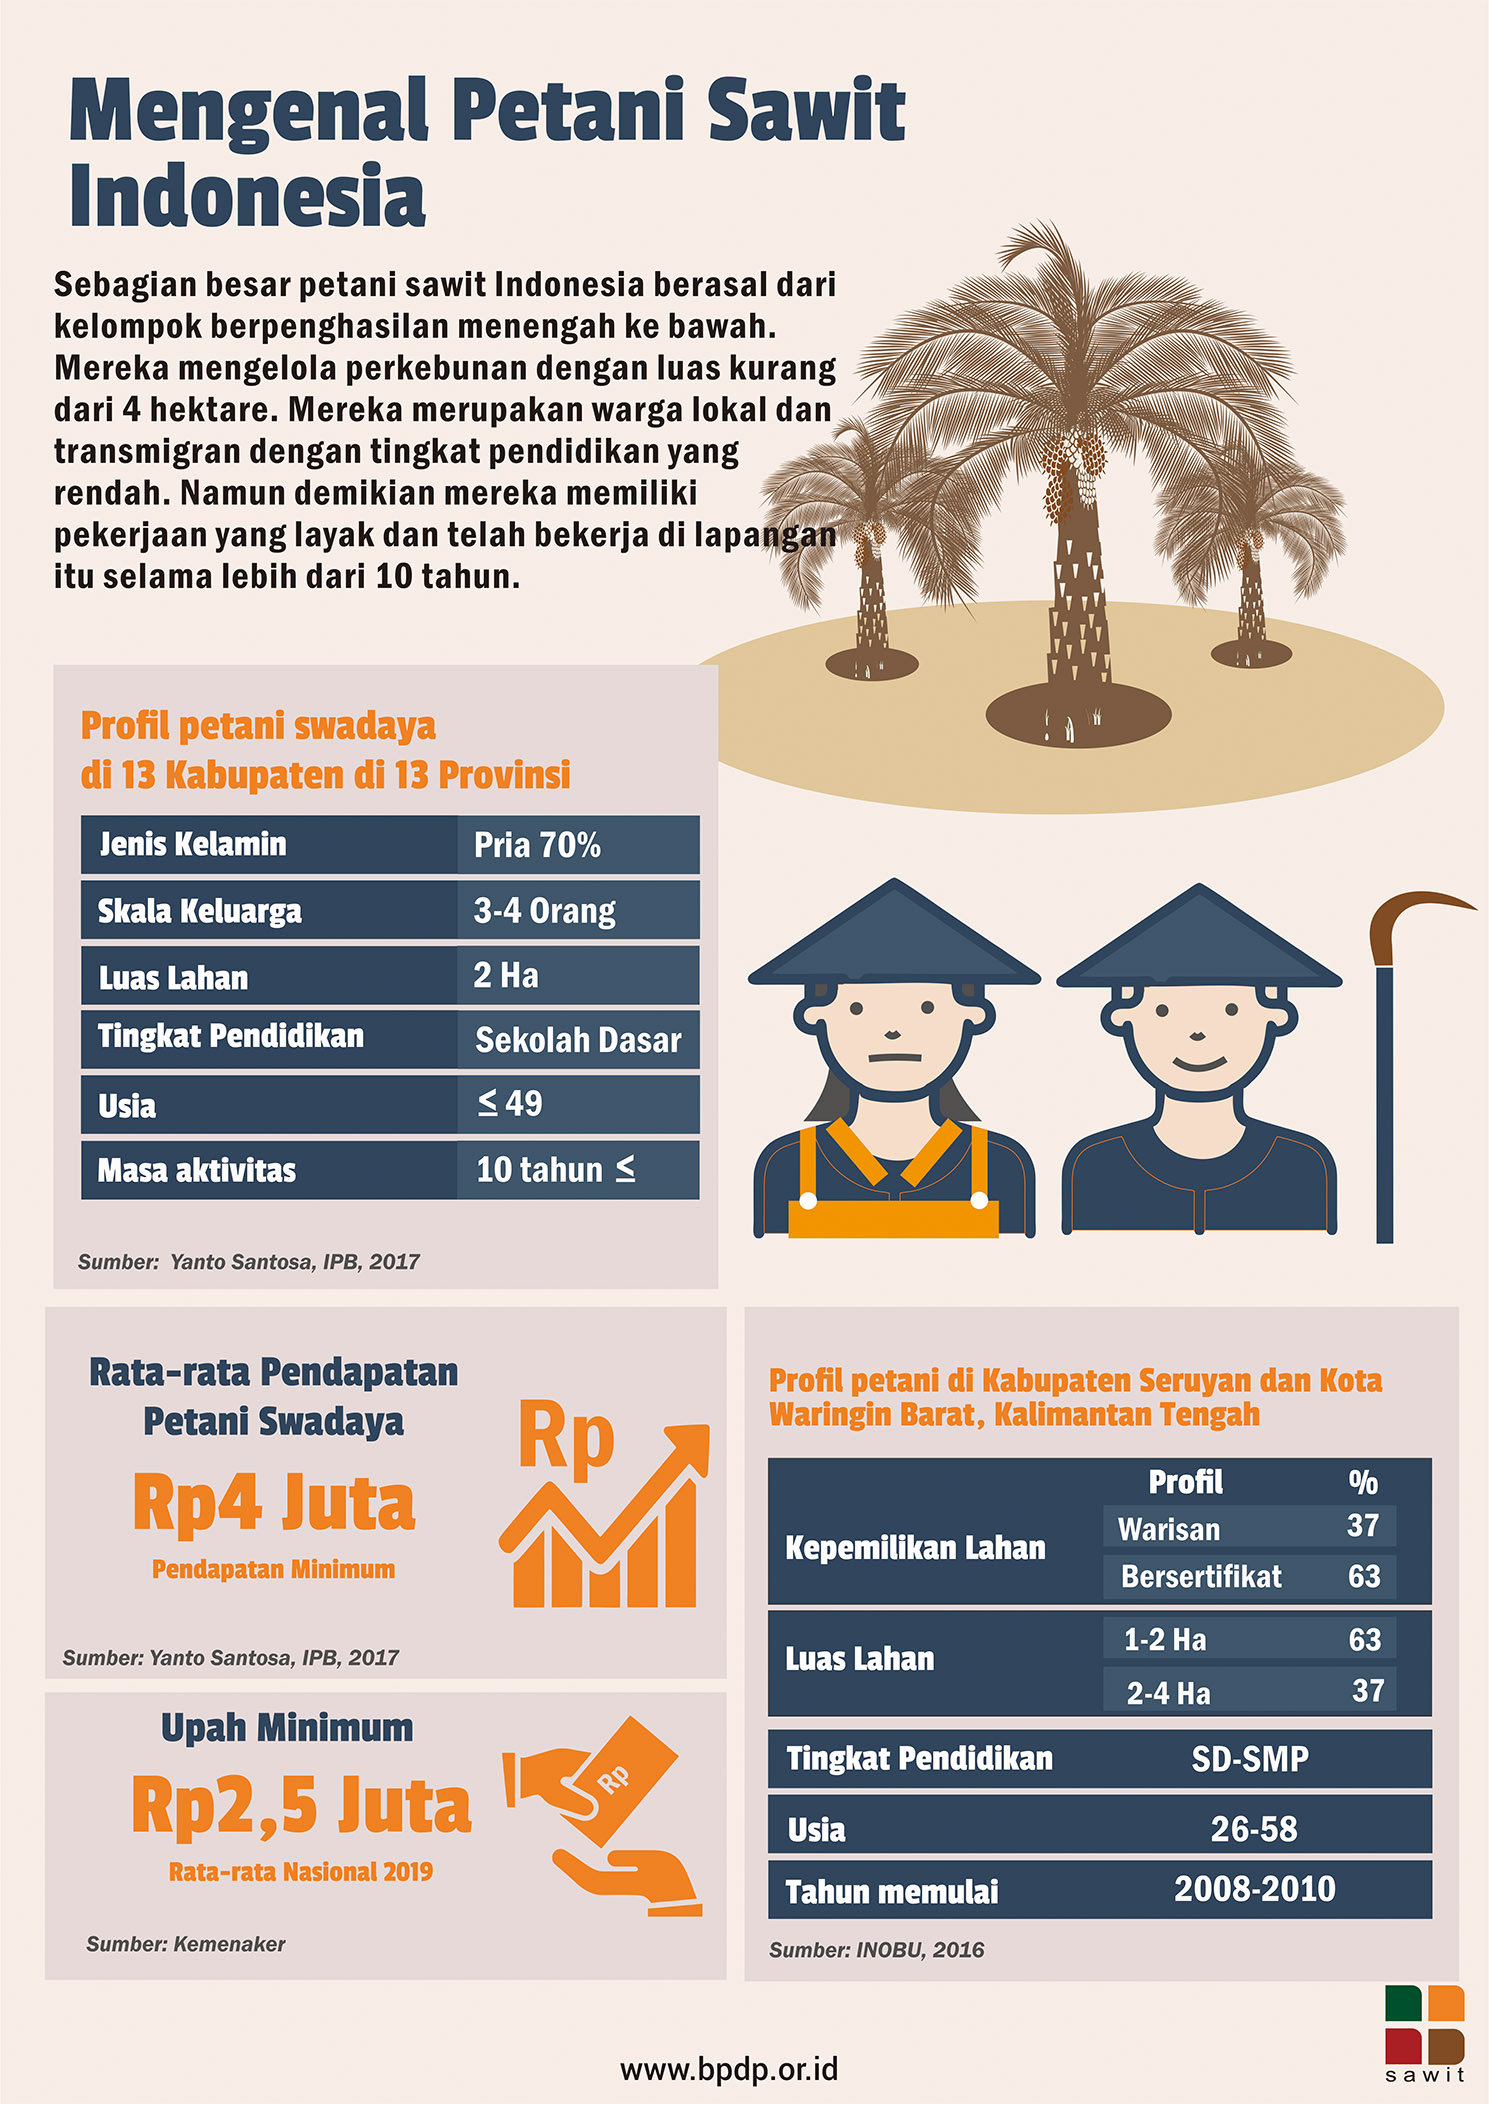 Mengenal Petani Sawit Indonesia